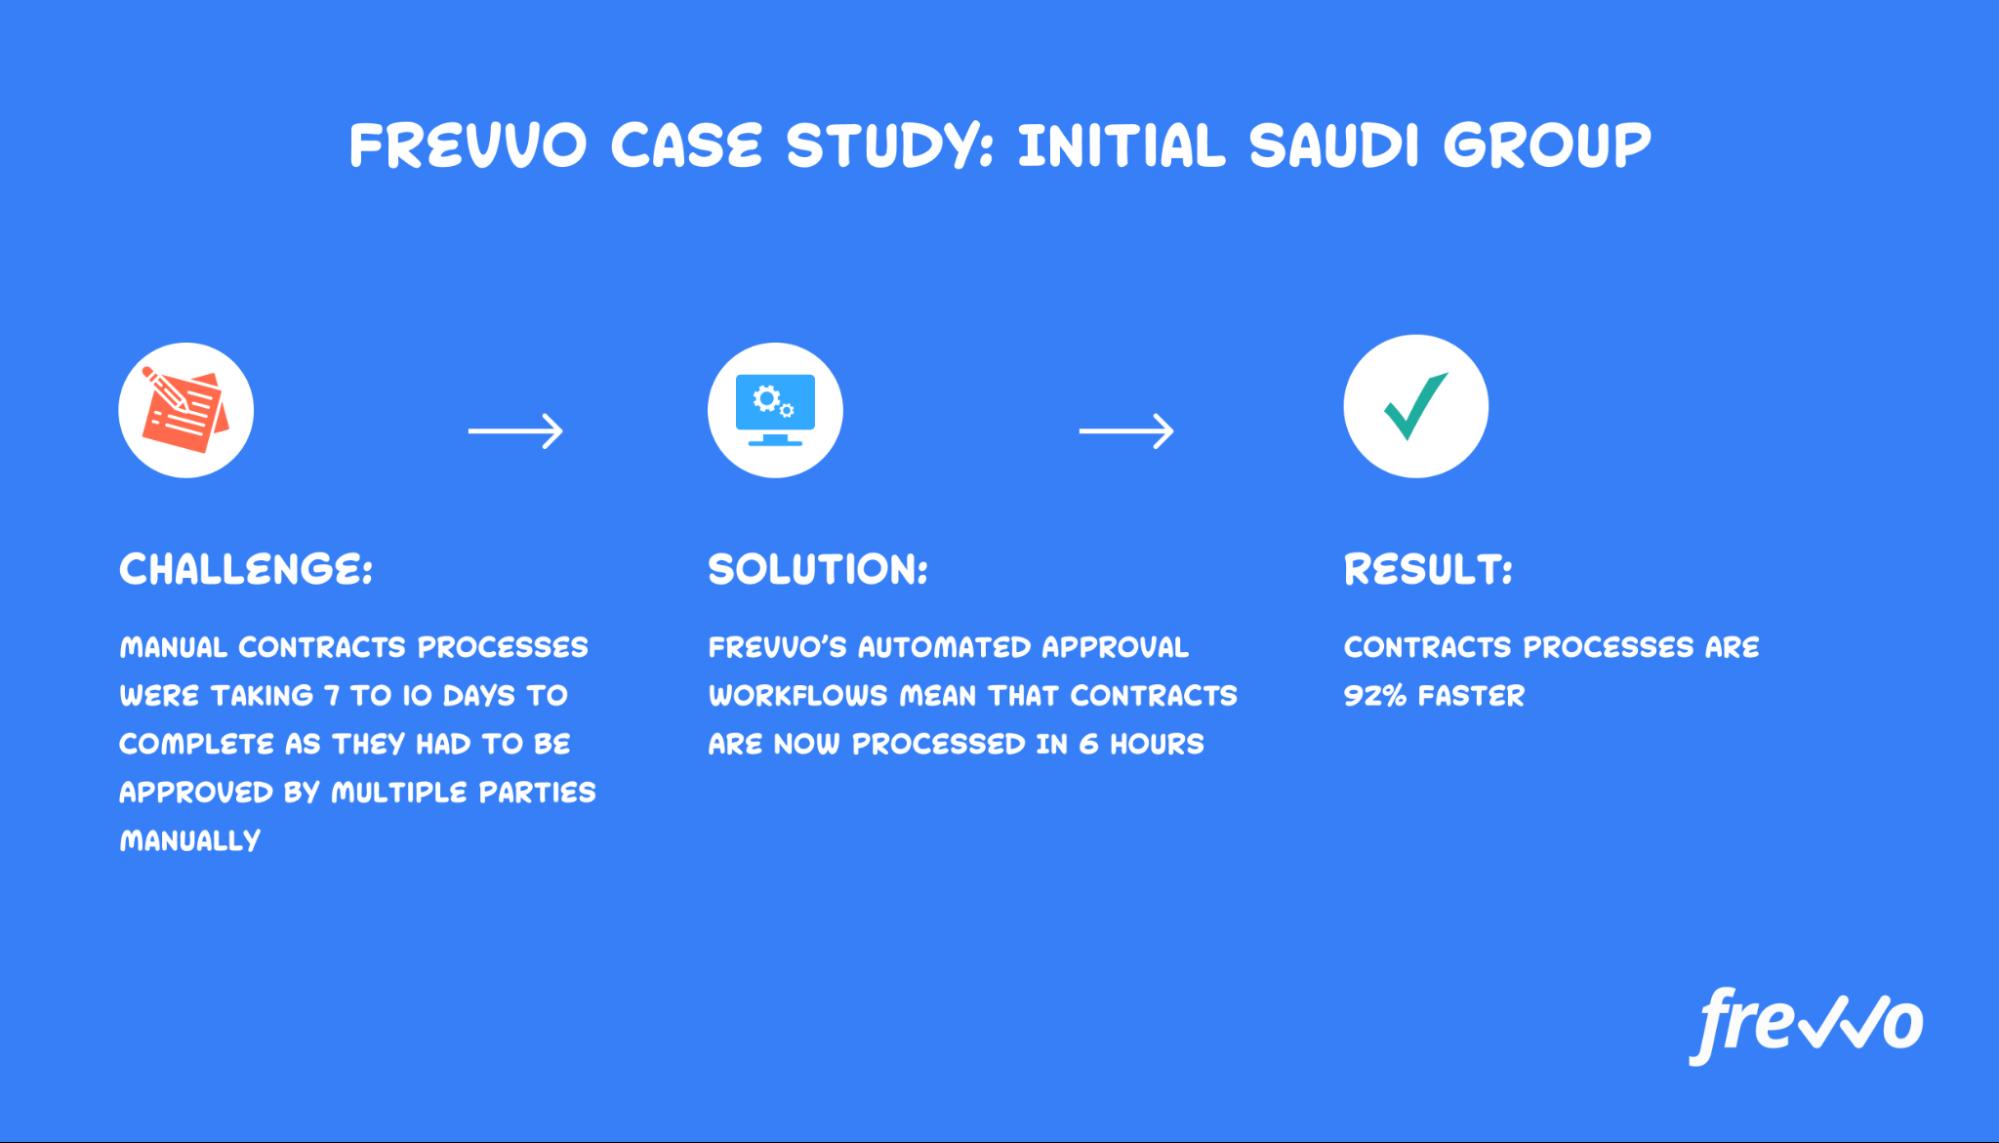 Initial Saudi Group case study using frevvo